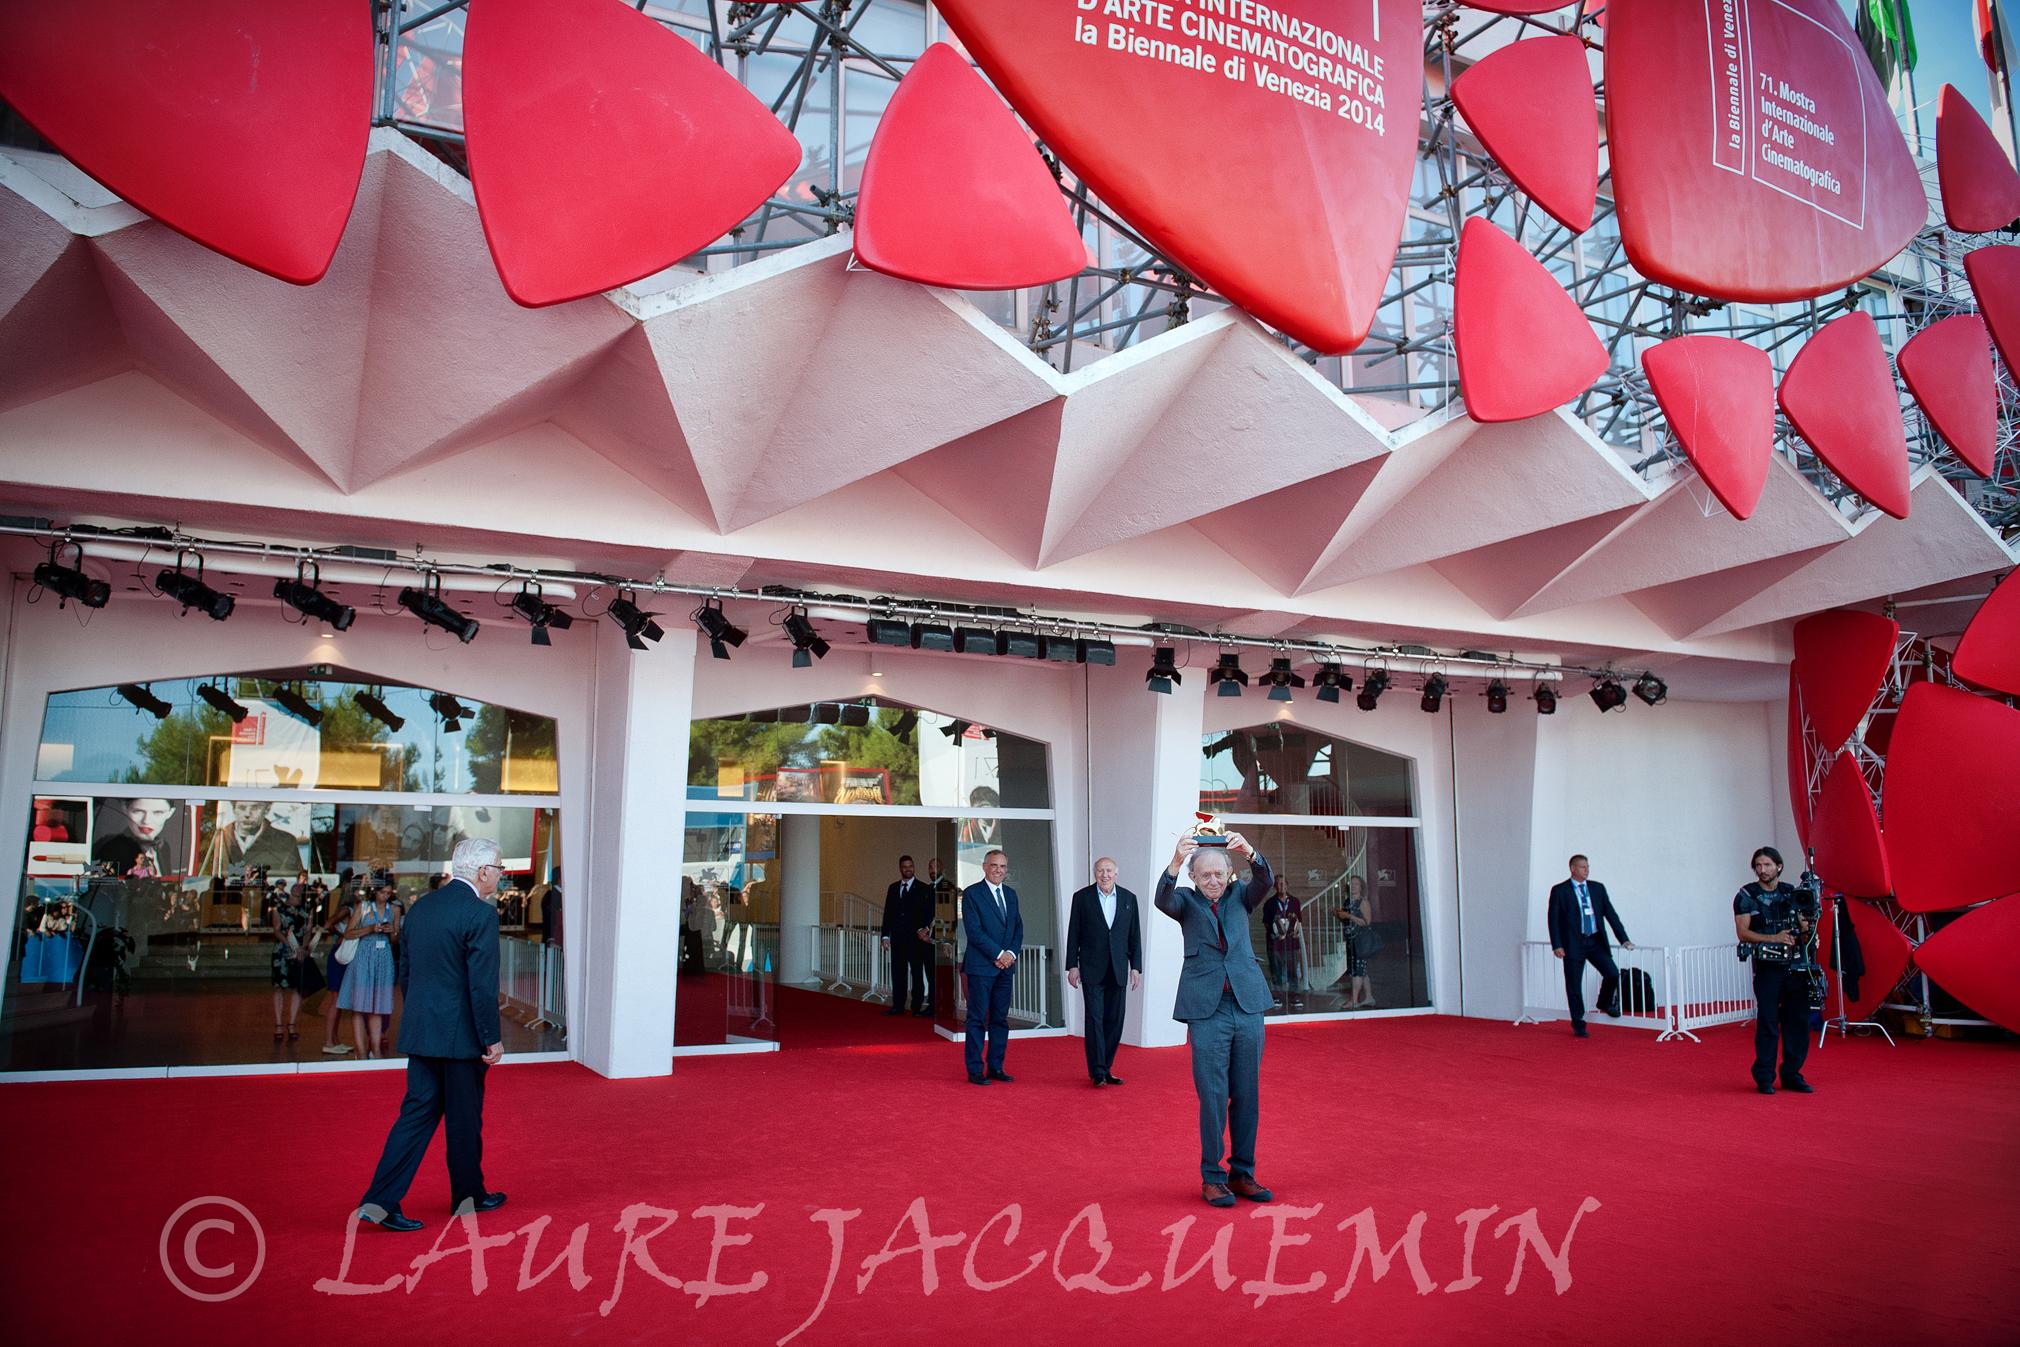 venice film festival venice laure jacquemin (1).jpg